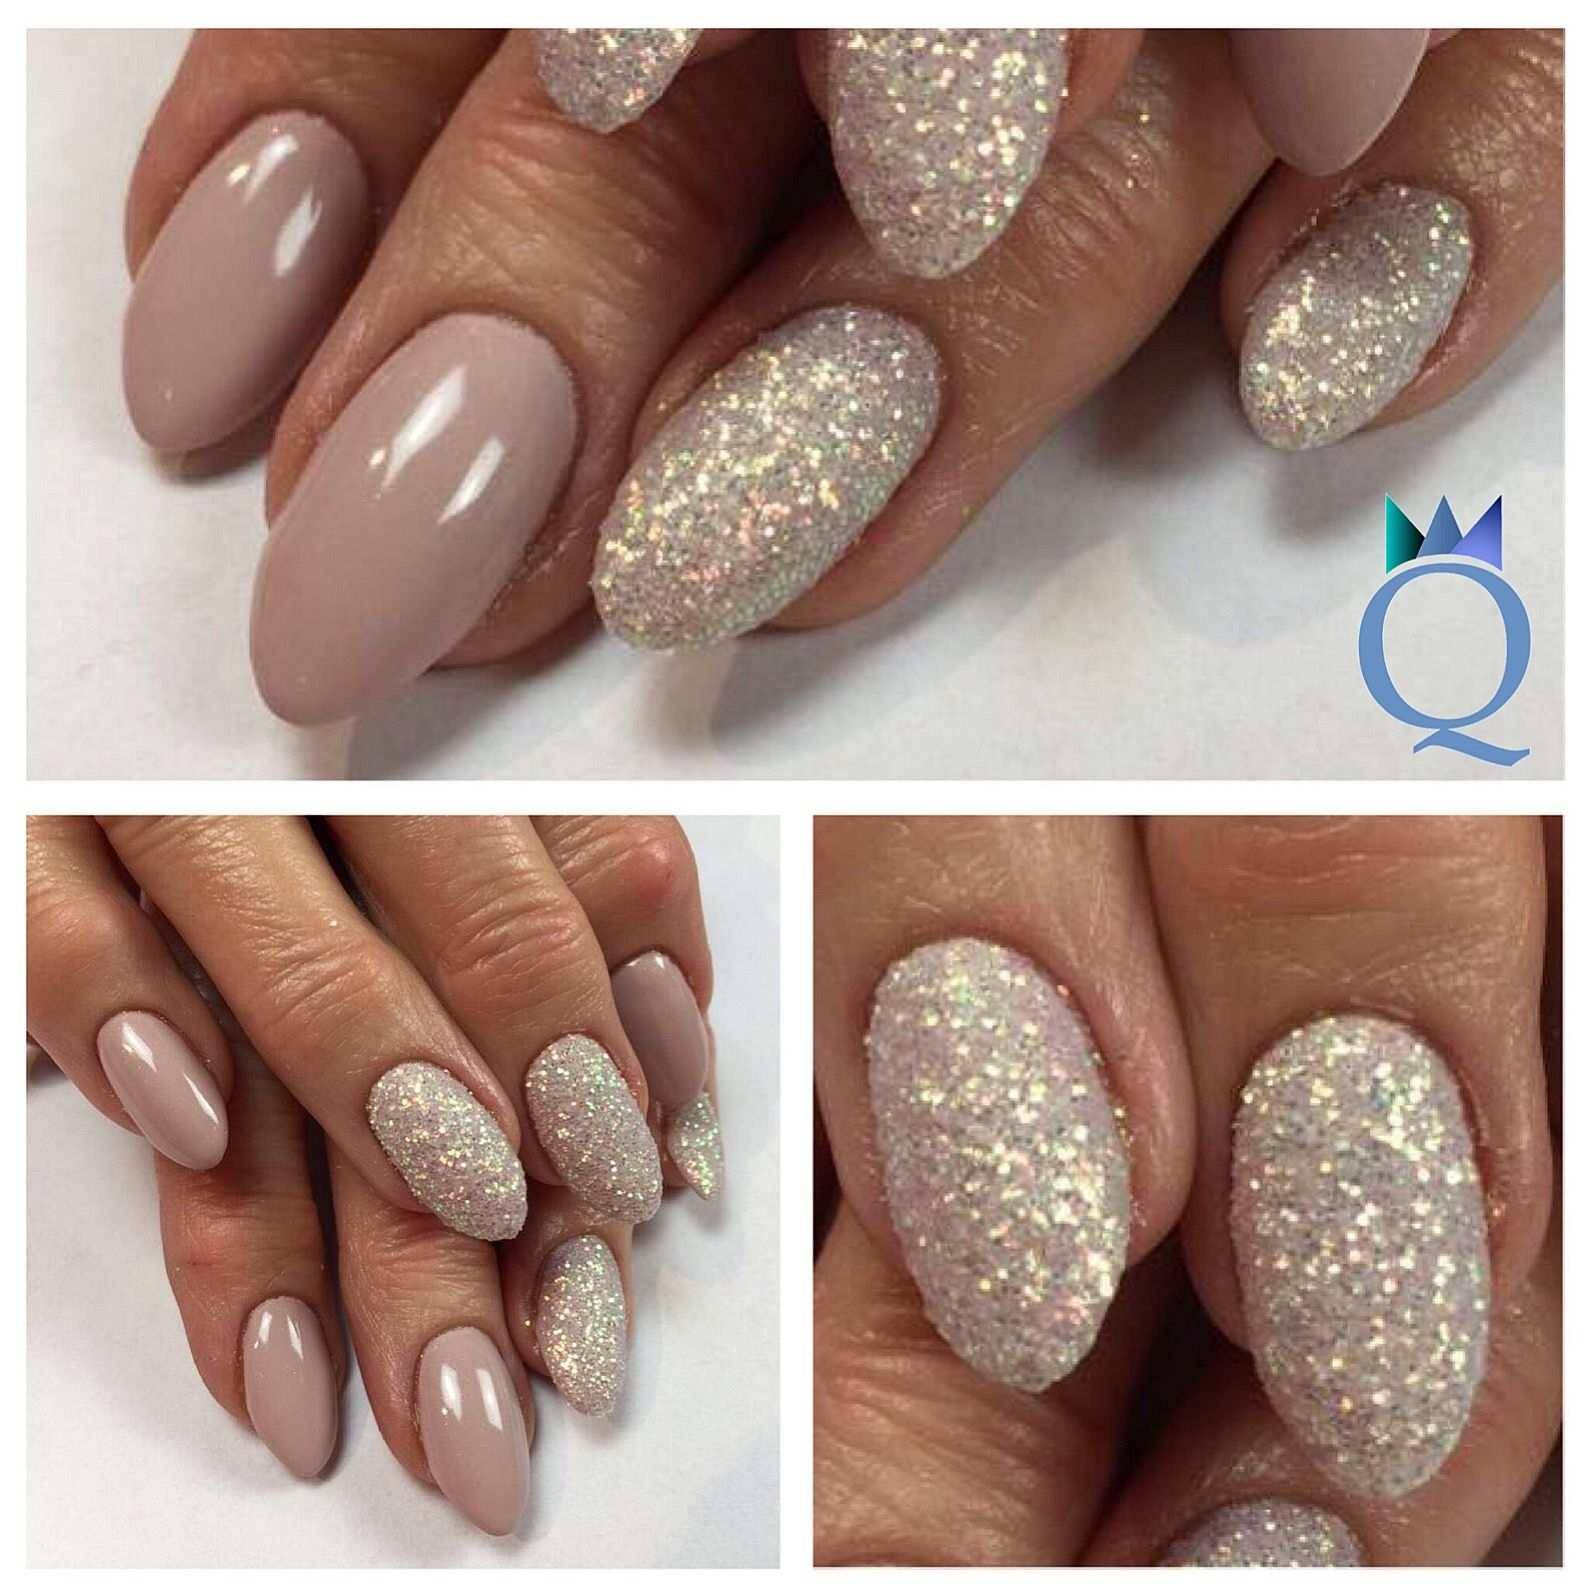 Almondnails Gelnails Nails Taupe Glitter Mandelform Gelnagel Nagel Taupe Glitzer Nagelstudio Mohlin Nailqueen Janine Nagelstudio Nageldesign Nails